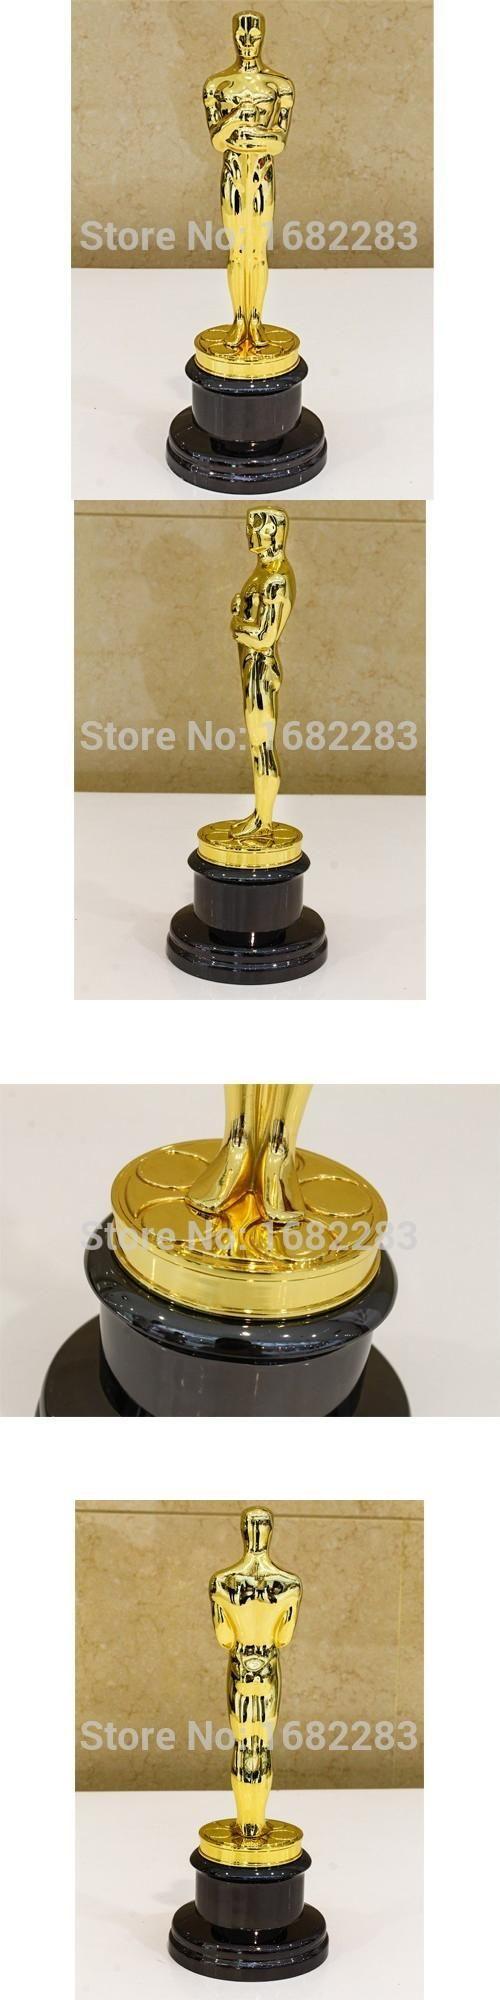 Academy Award Oscar Statue,Oscar Trophy, Zinc Alloy Replica Oscar Trophy,